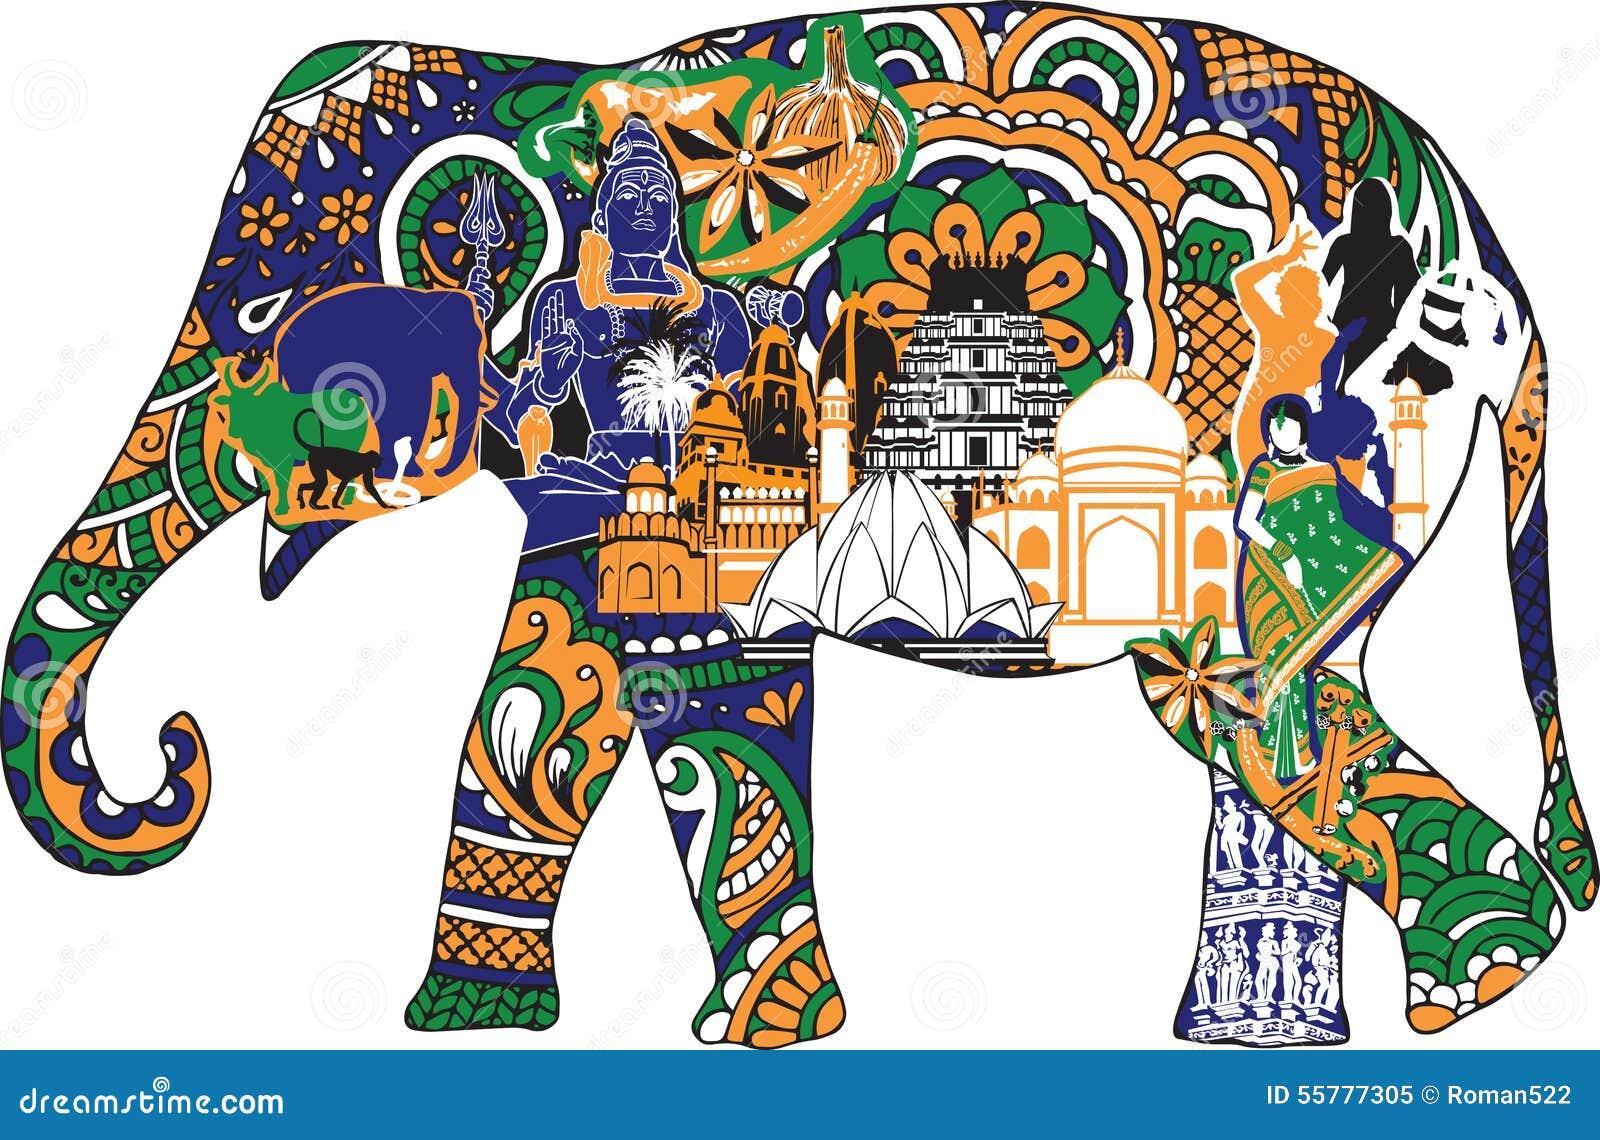 elephant with indian symbols stock vector illustration of shiva asia 55777305. Black Bedroom Furniture Sets. Home Design Ideas